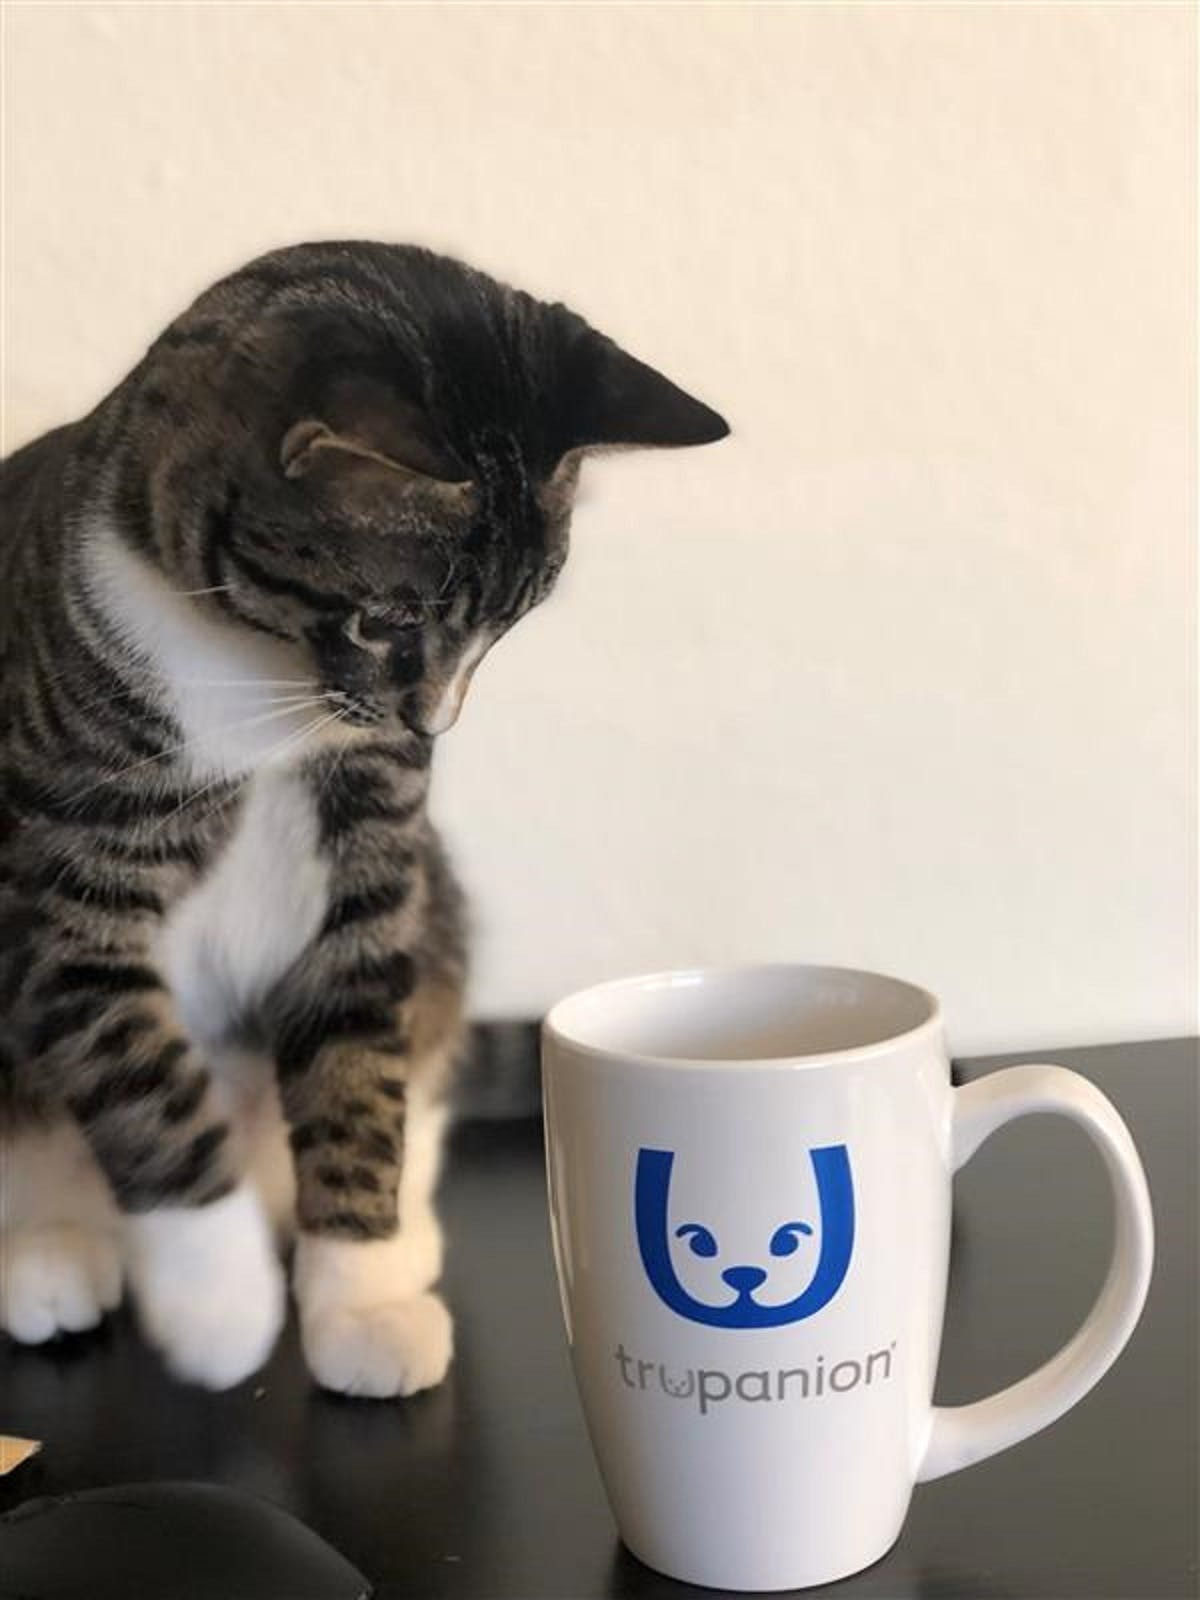 Rajah the cat sits next to a Trupanion coffee mug